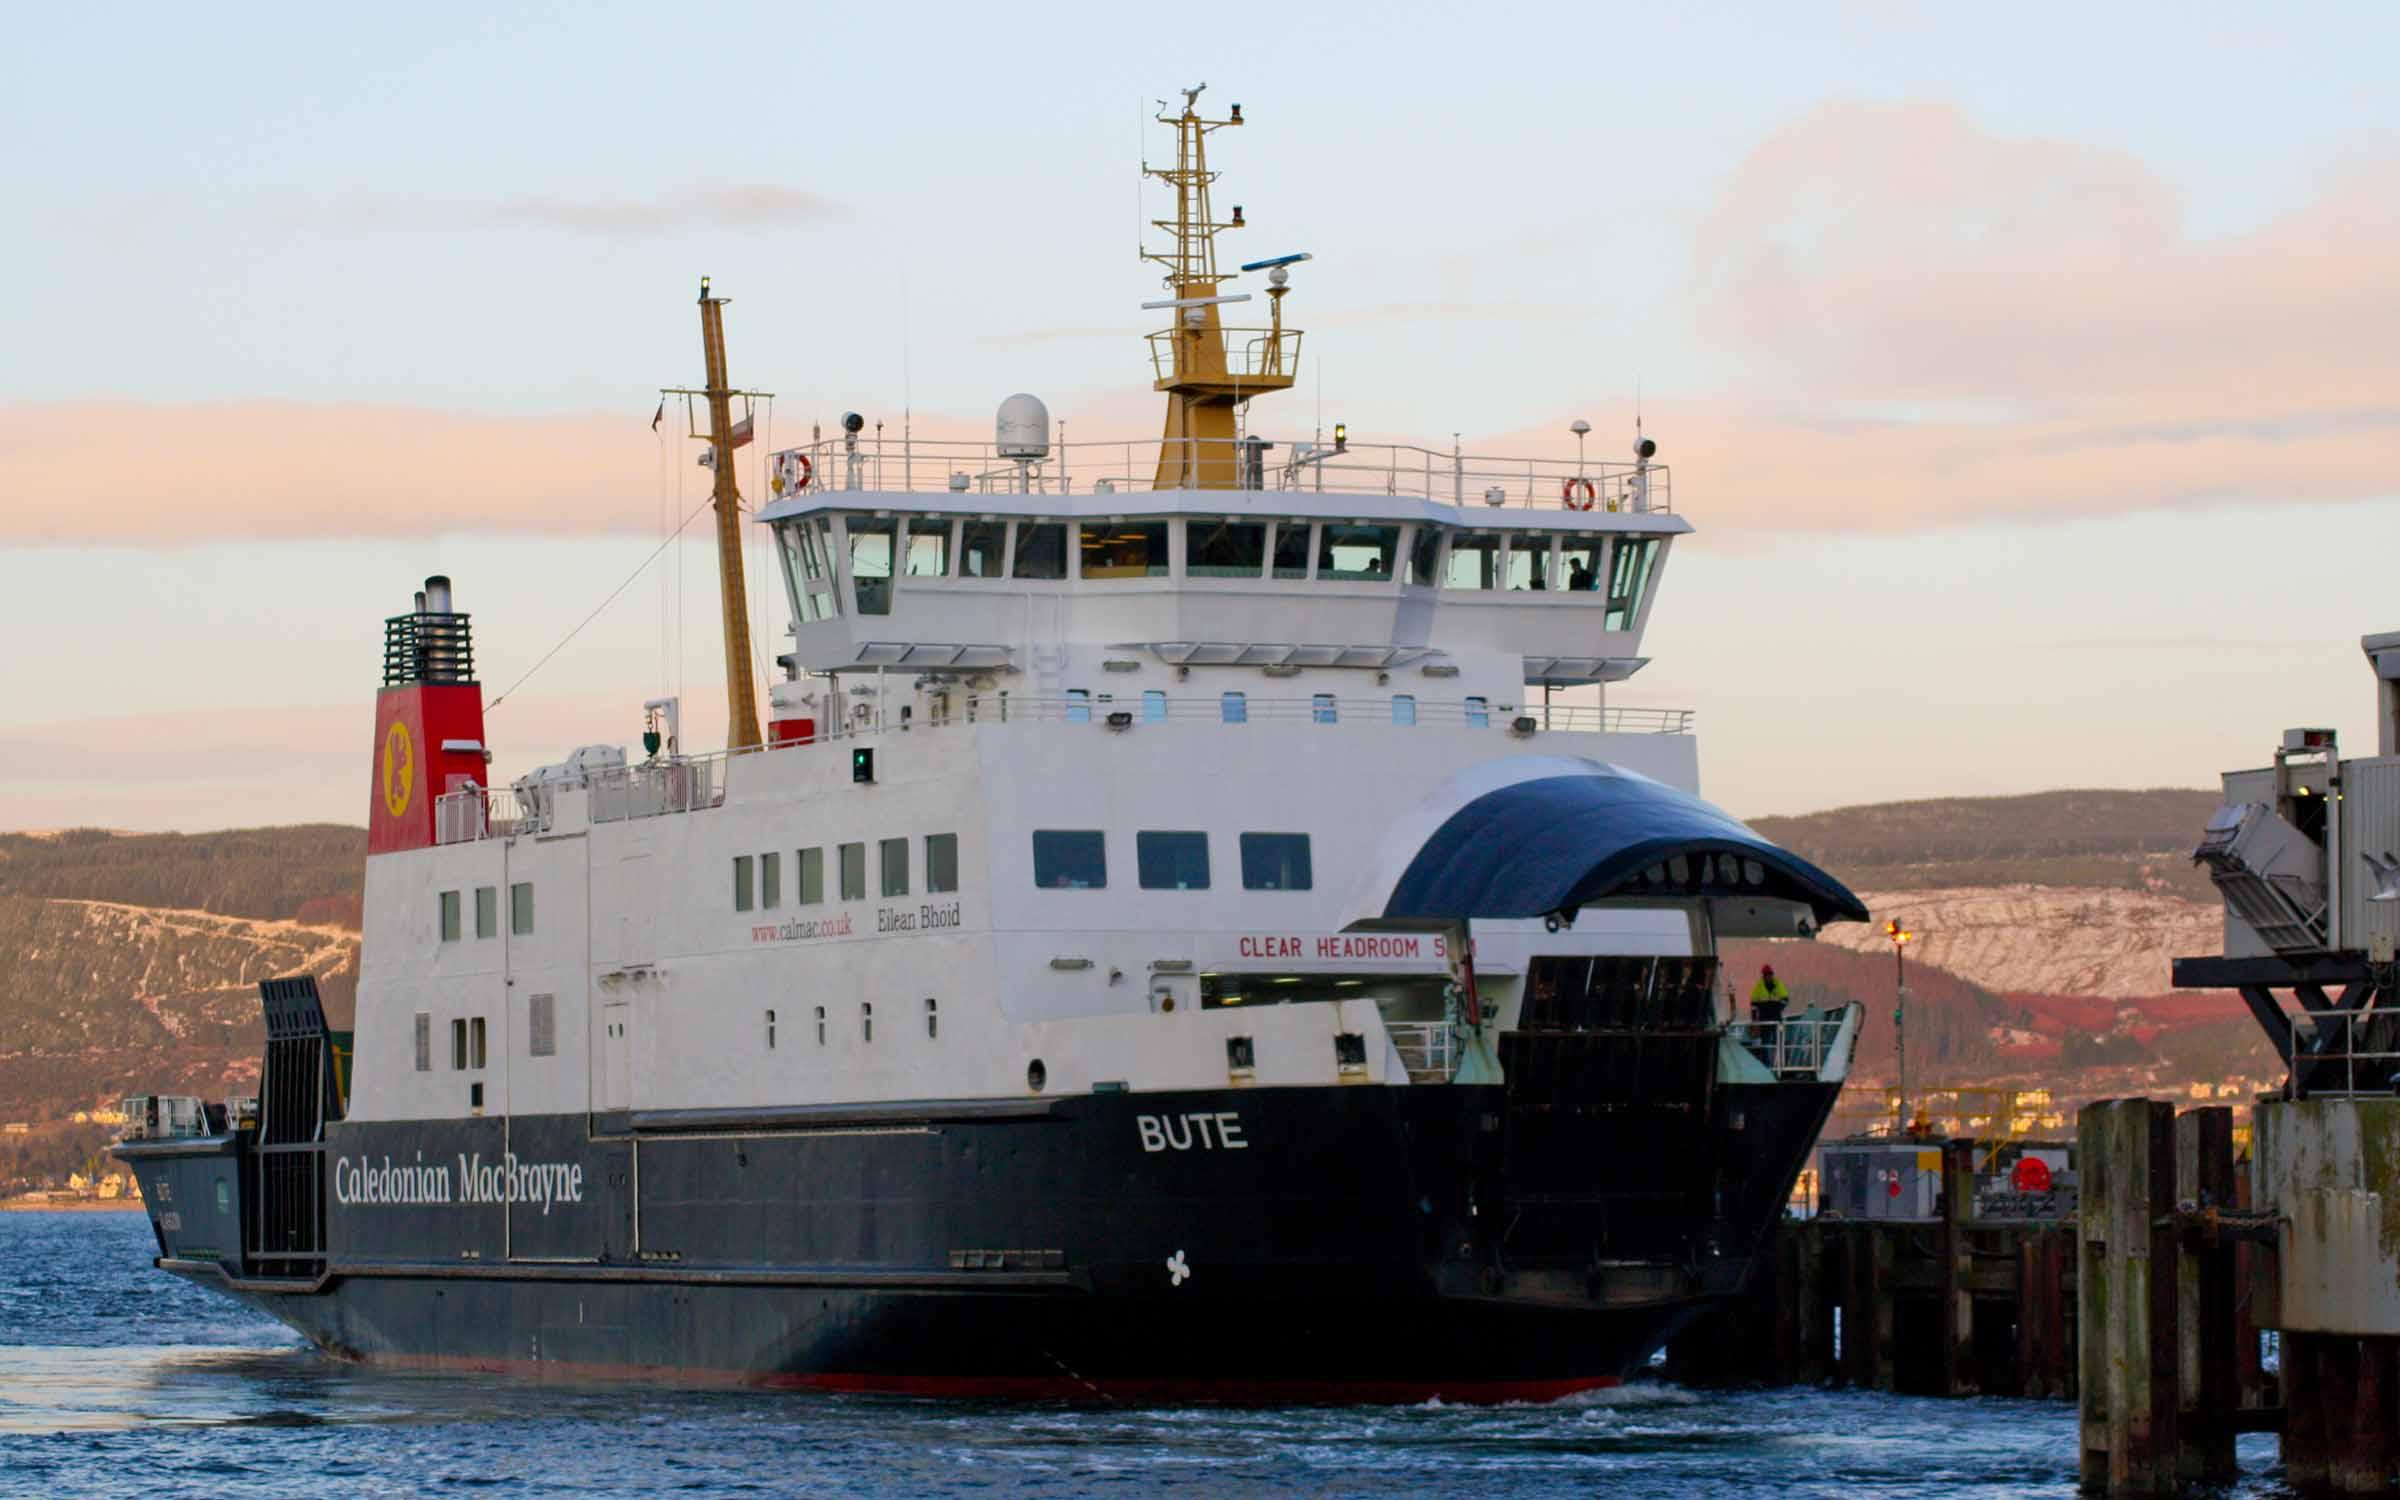 Bute arriving at Wemyss Bay (Ships of CalMac)